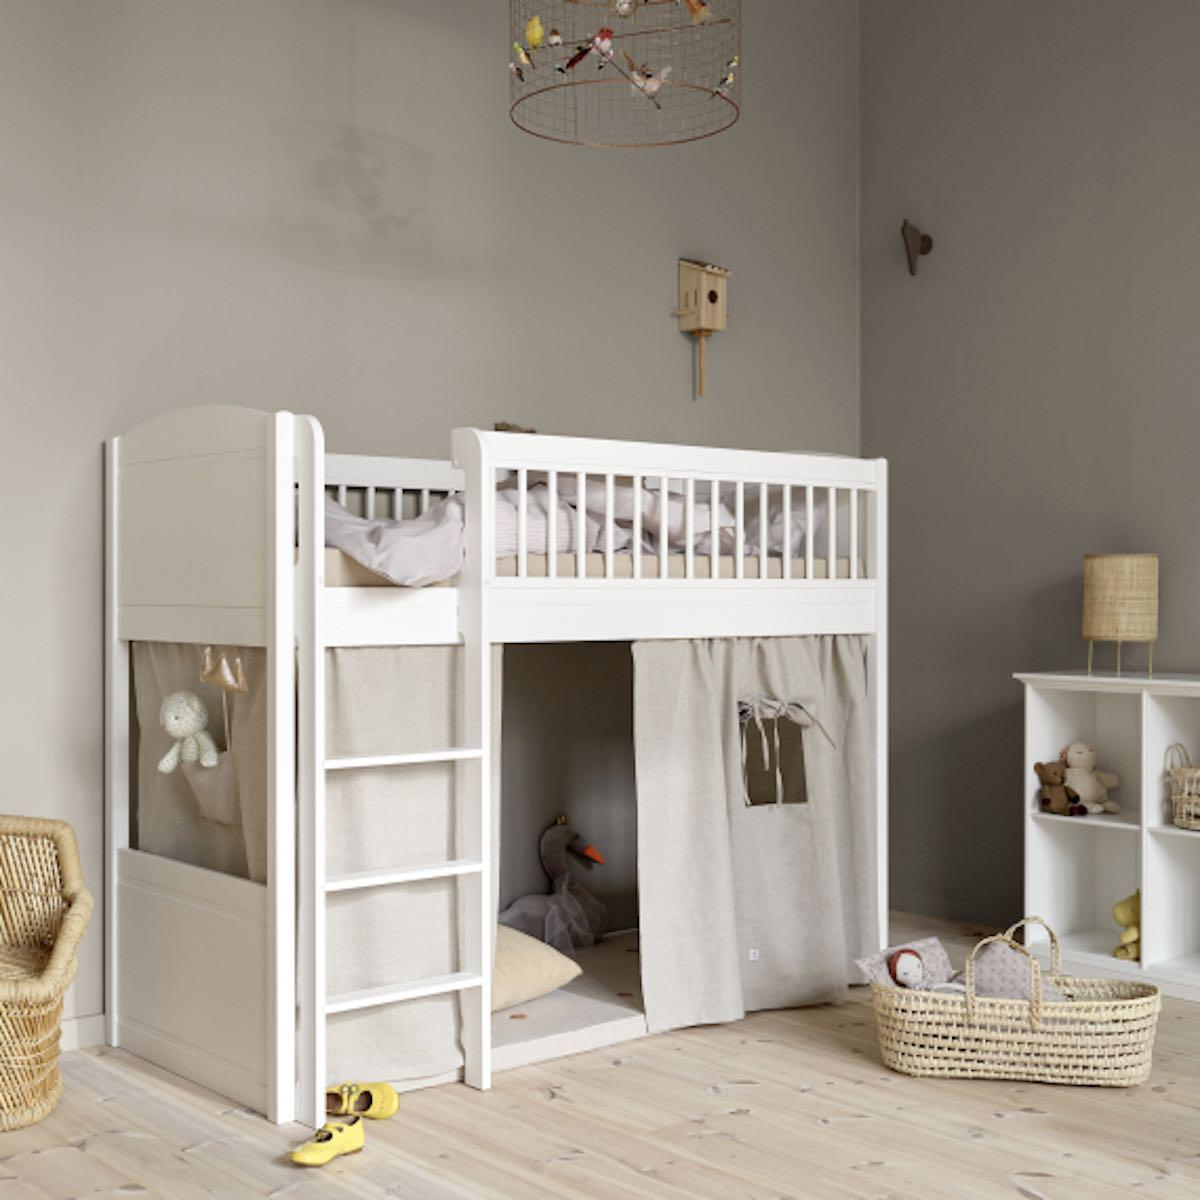 Cortina cama media-alta SEASIDE LILLE+ Oliver Furniture natural